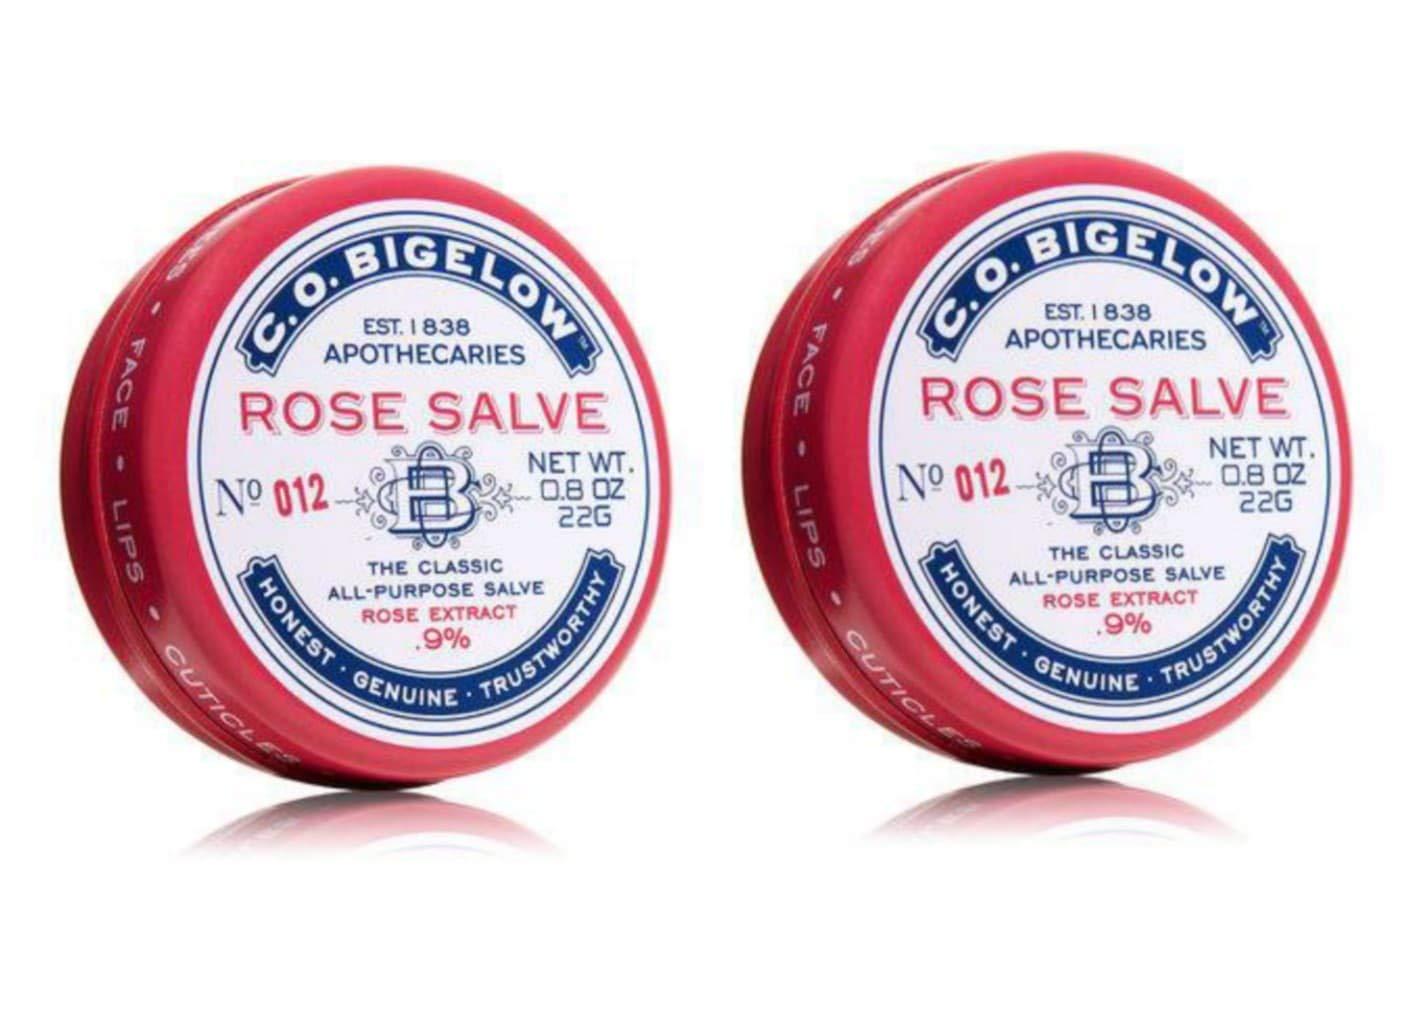 All Purpose Classic Rose Salve Lip Balm, .8 Oz (22g) Tin, 2 Pack